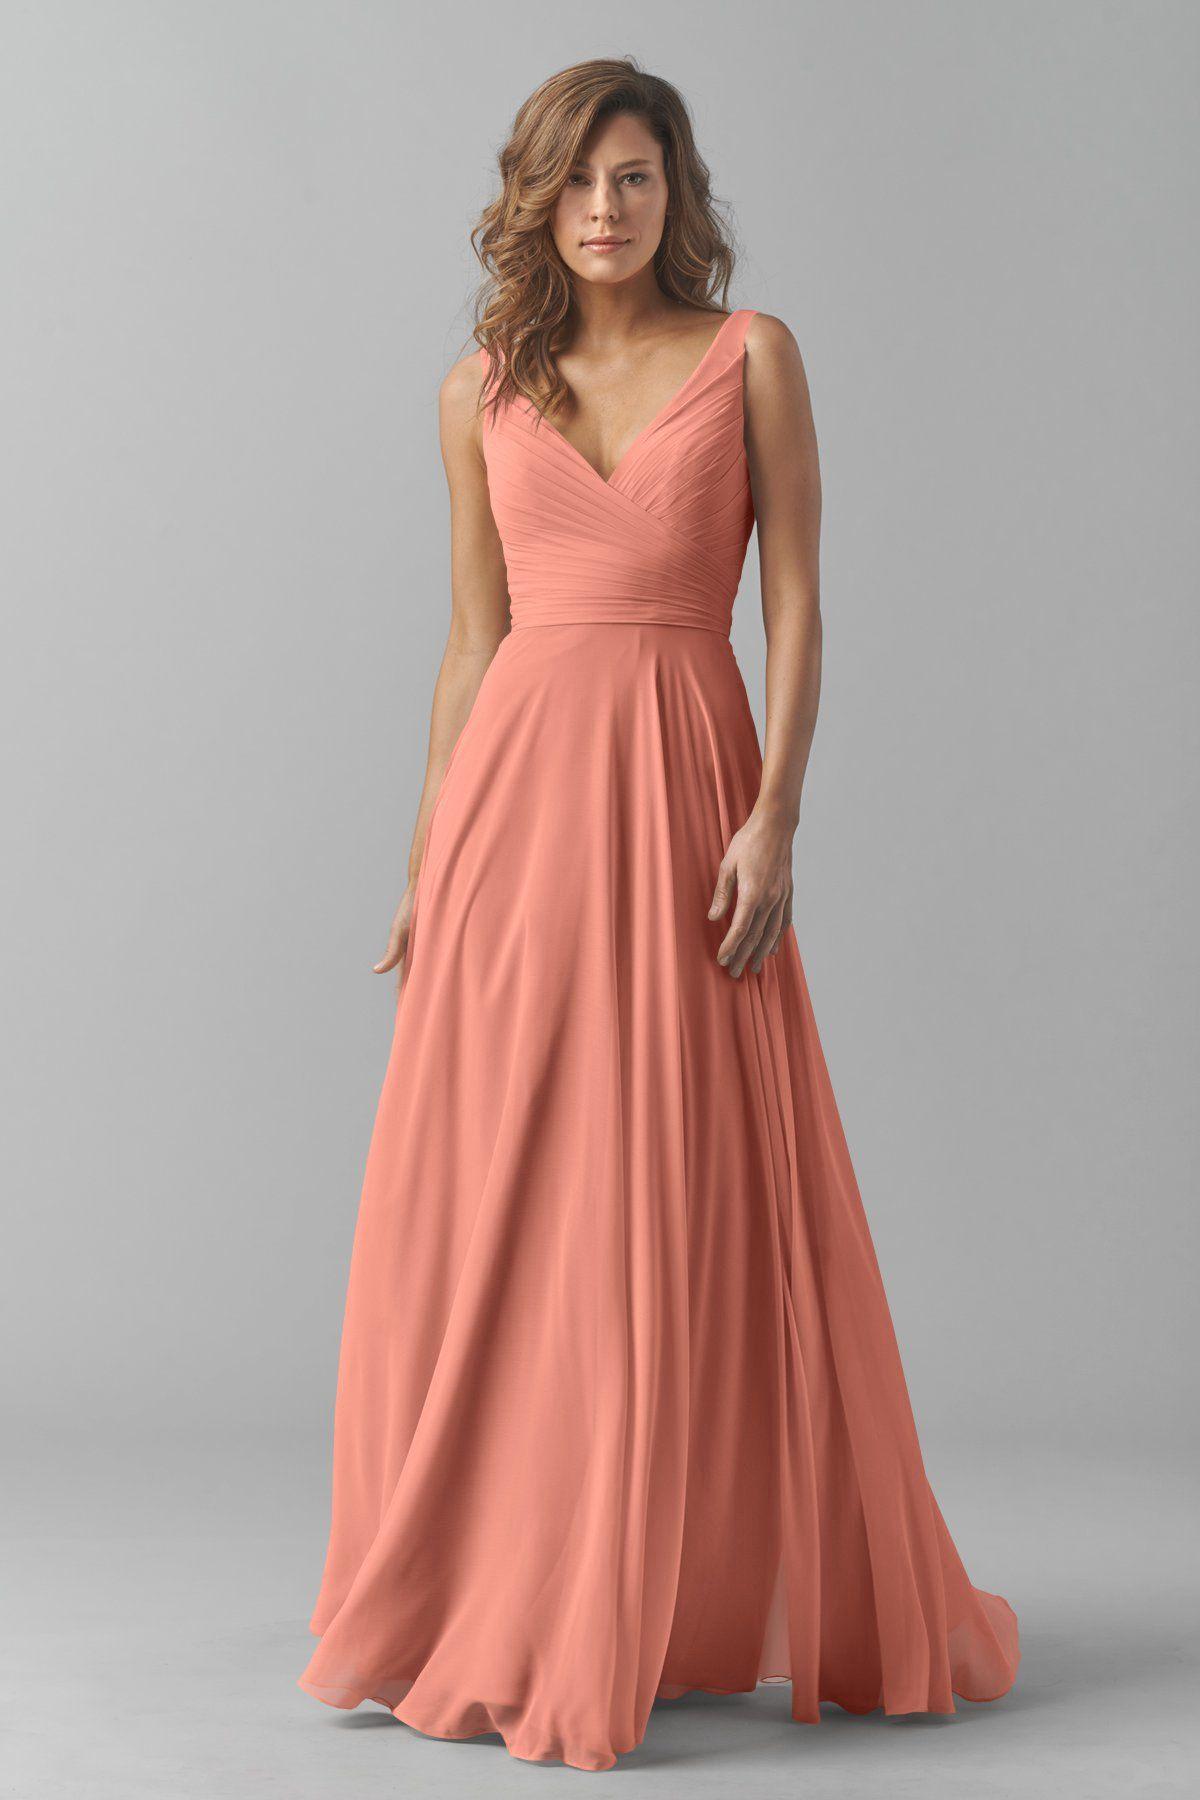 media/uploads/product/8542i/colored/coral.jpg | Bridesmaid Dresses ...